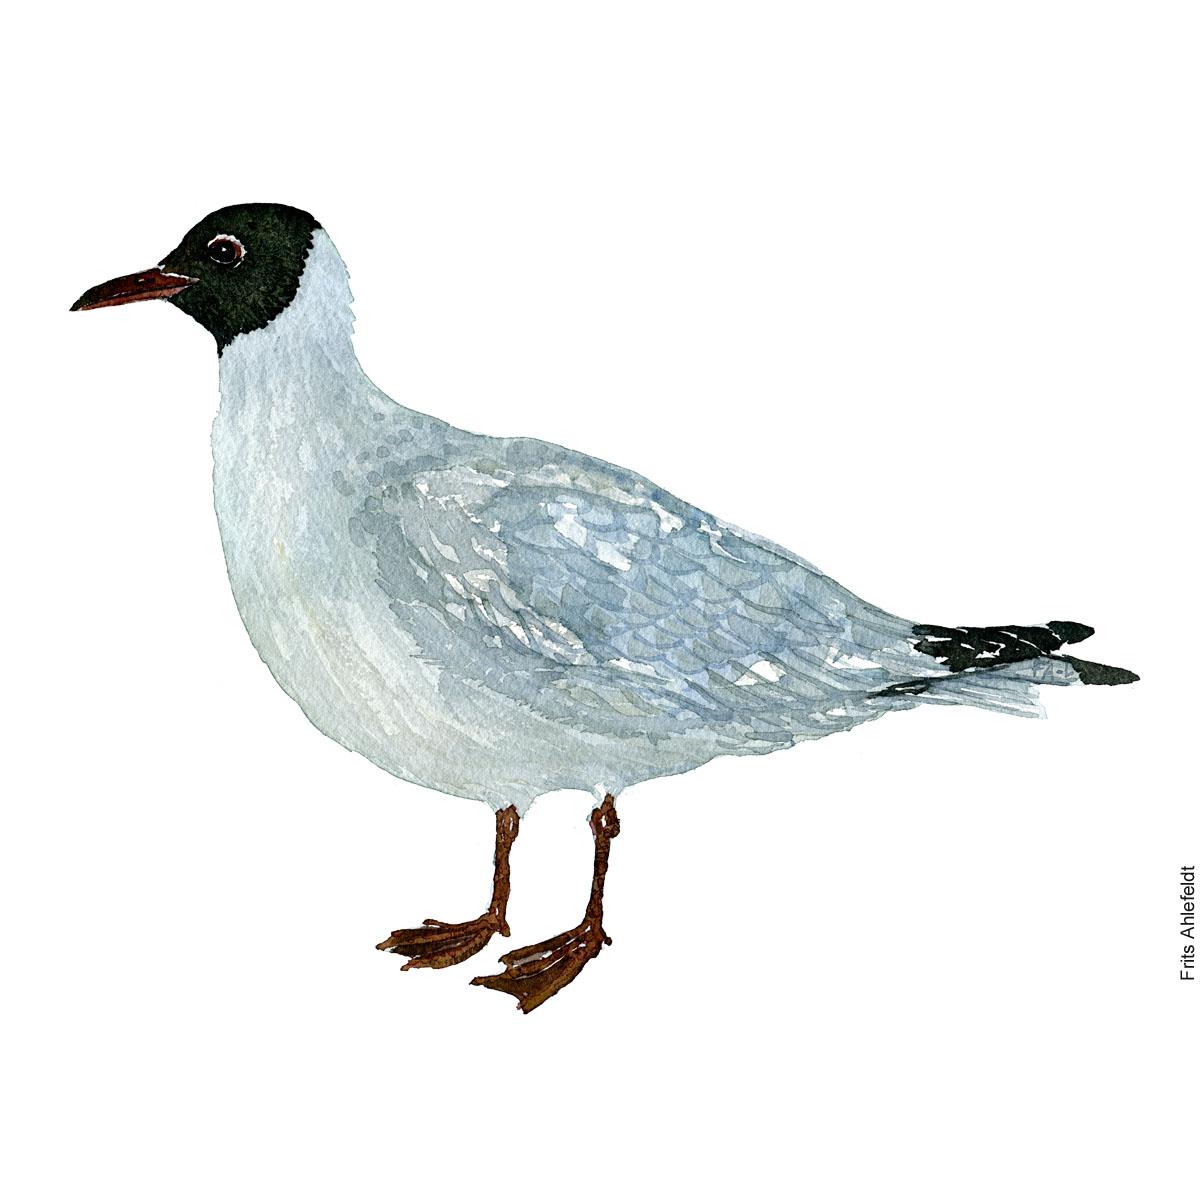 Haettemaage - Black-necked gull Bird watercolor. Fugle akvarel af Frits Ahlefeldt